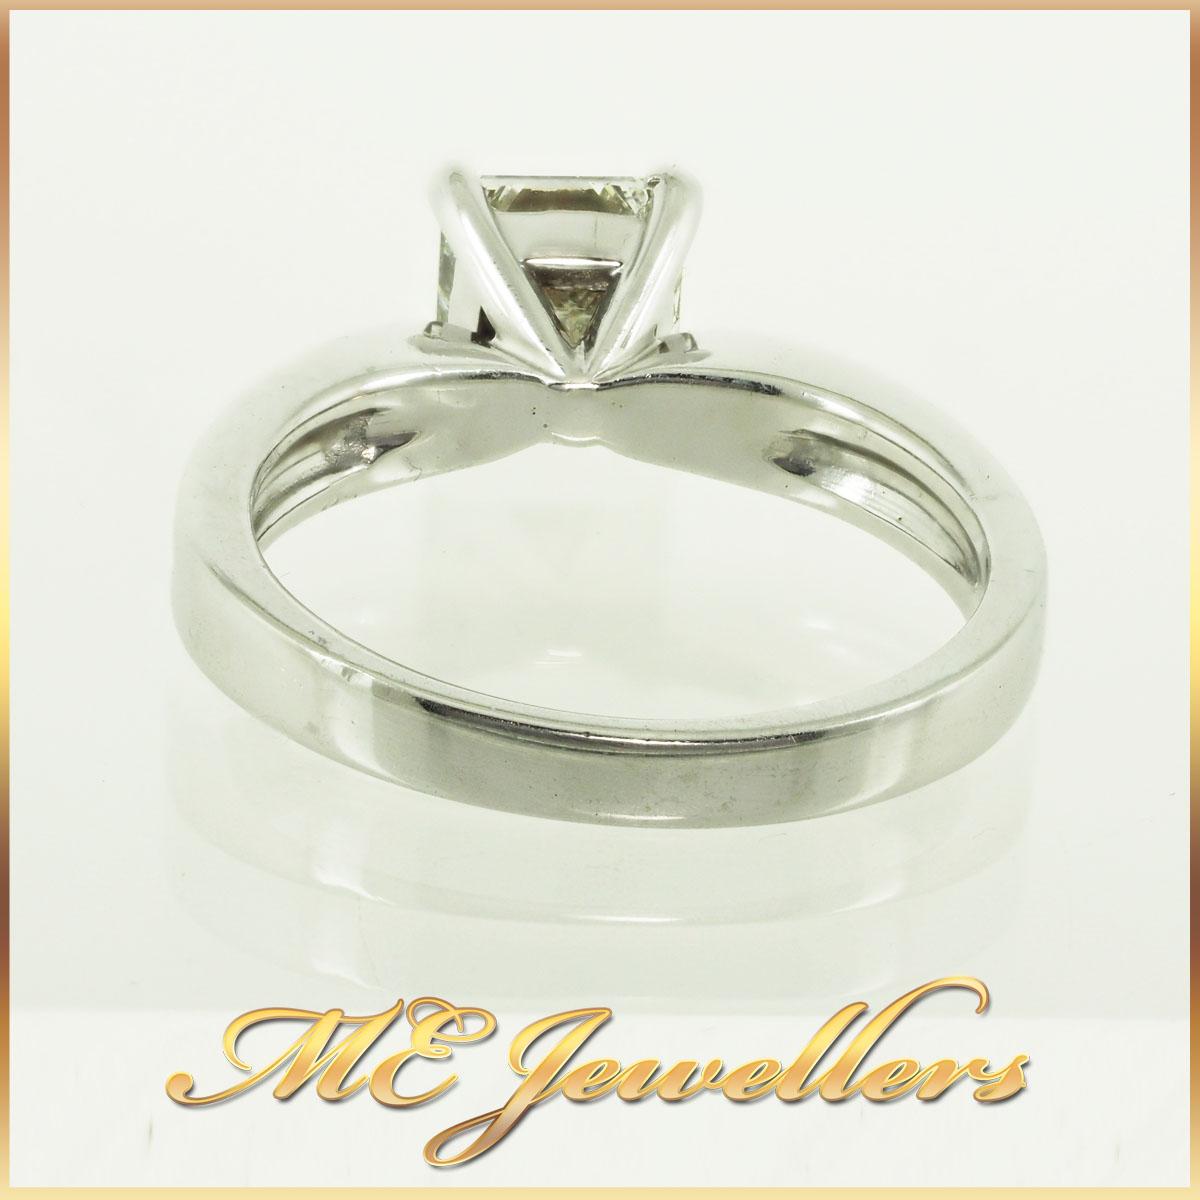 287 1.09Ct K/SI1 Princess Cut Engagement Ring 3